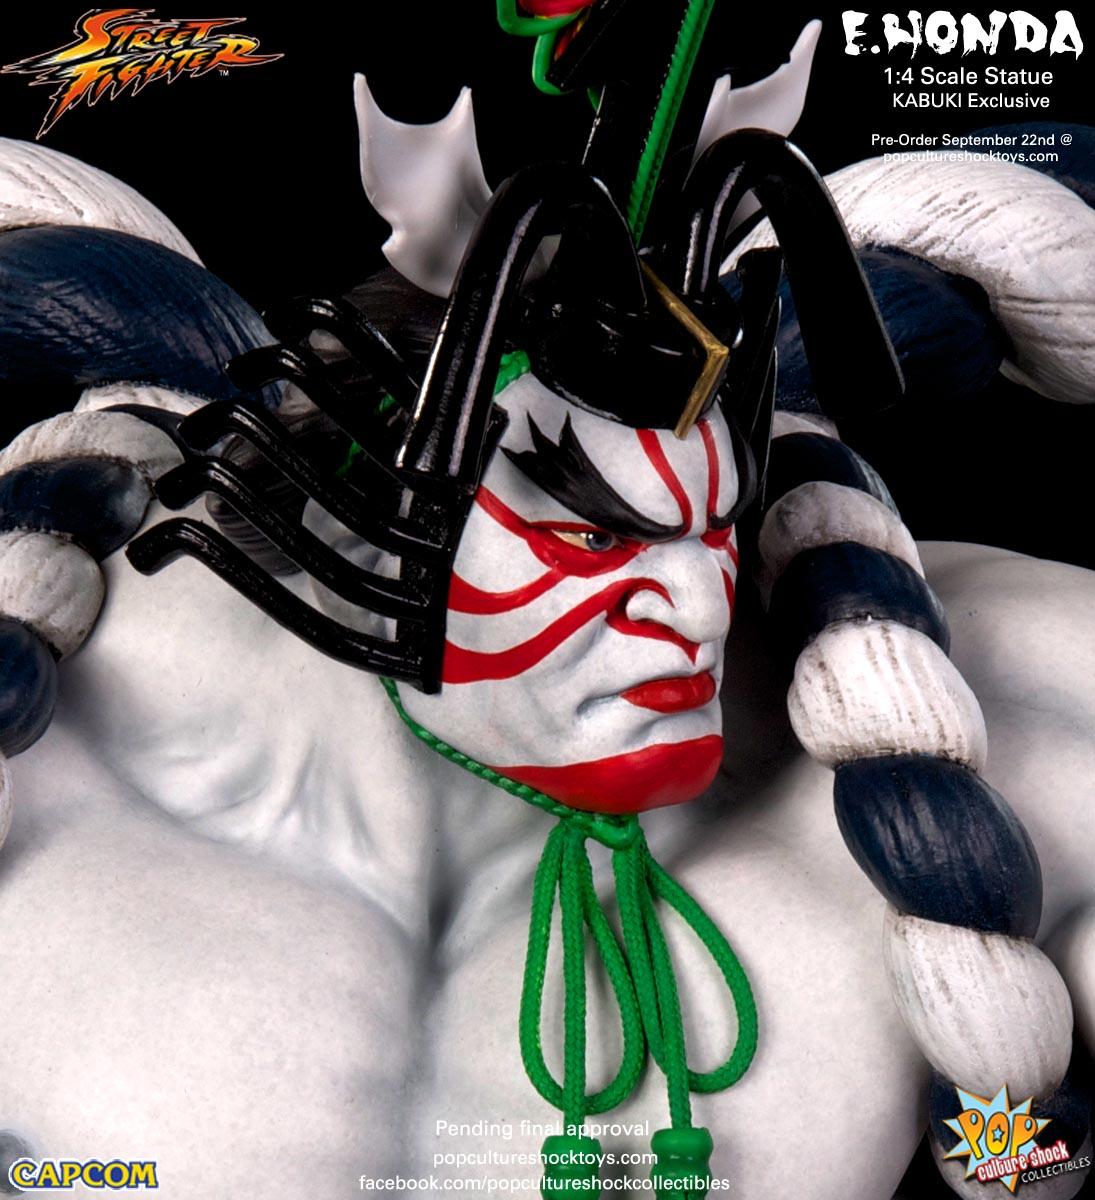 [Pop Culture Shock] Street Fighter: E. Honda 1/4 Statue - Página 3 Street-Fighter-E.-Honda-Kabuki-Statue-027